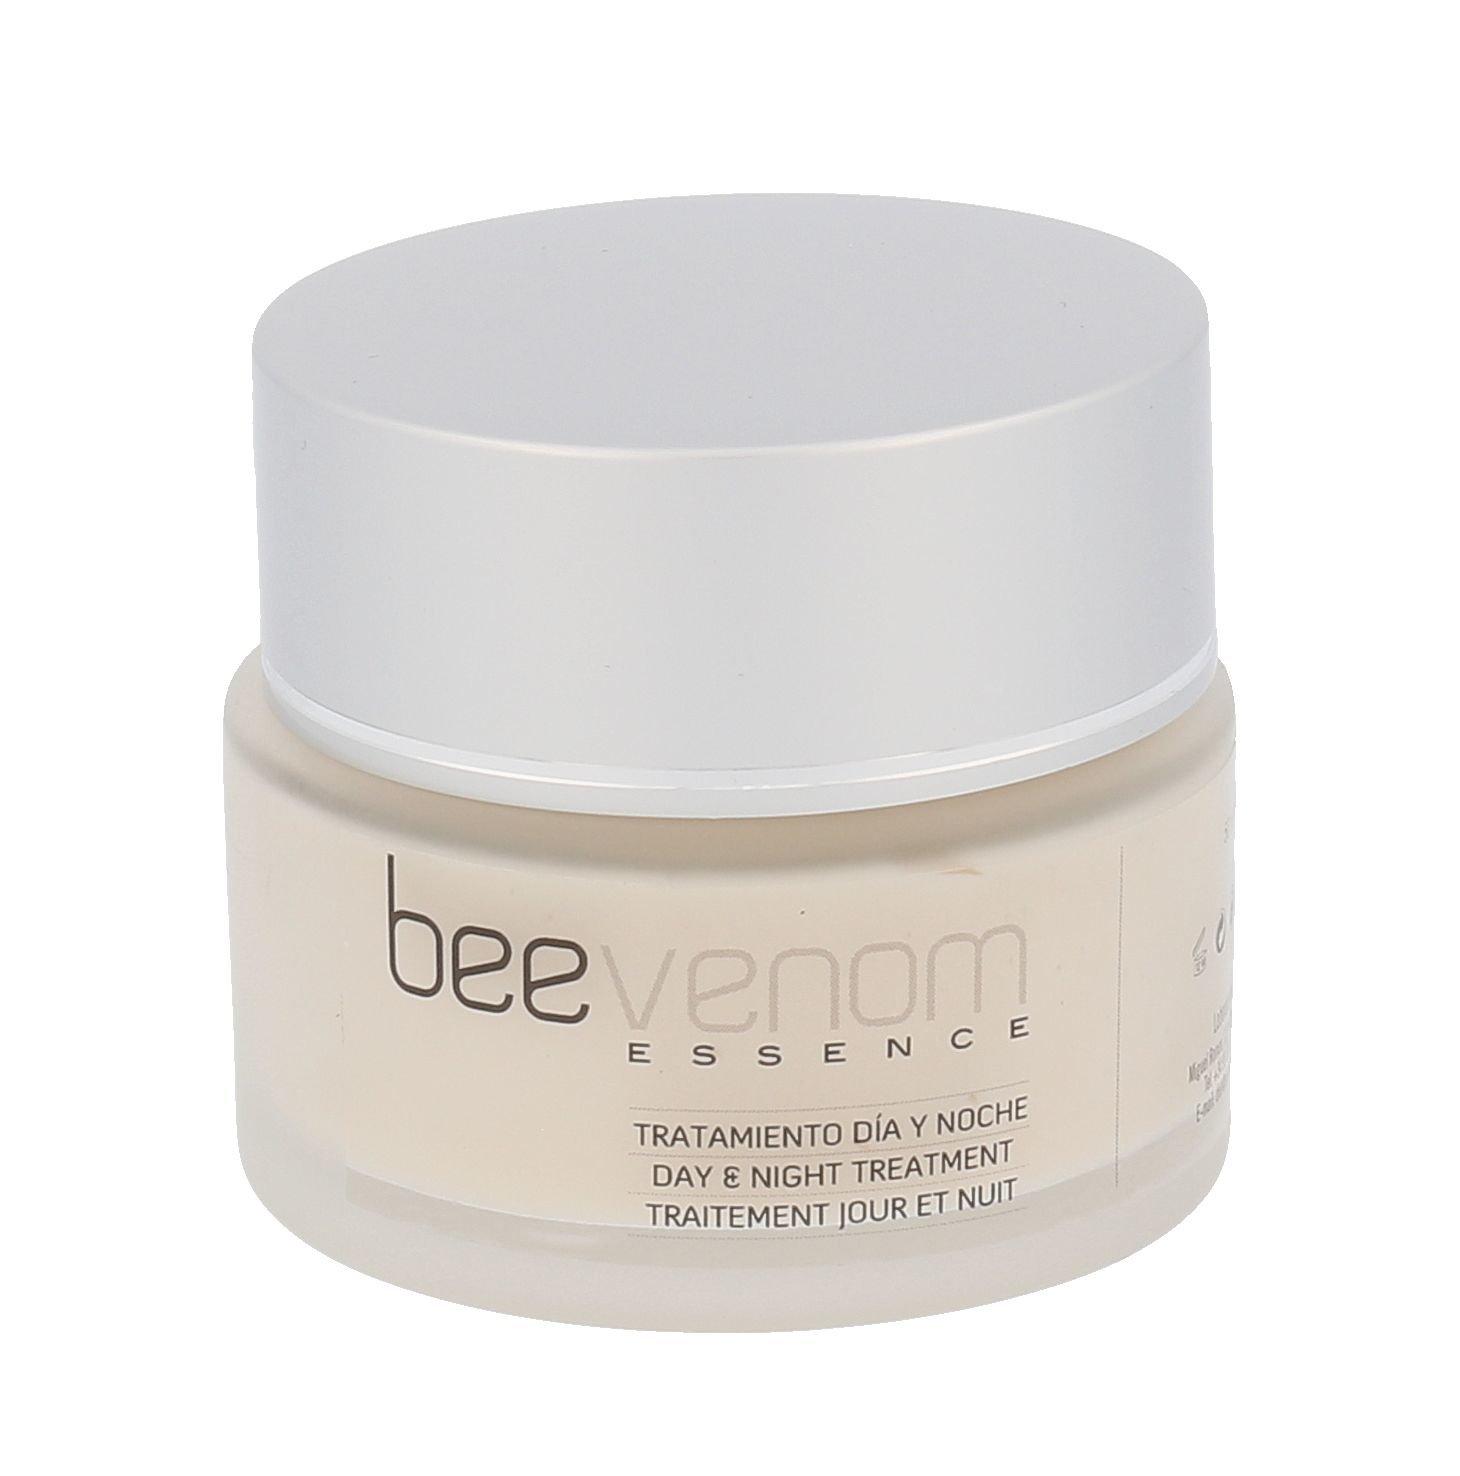 Diet Esthetic Bee Venom Essence Cream Cosmetic 50ml